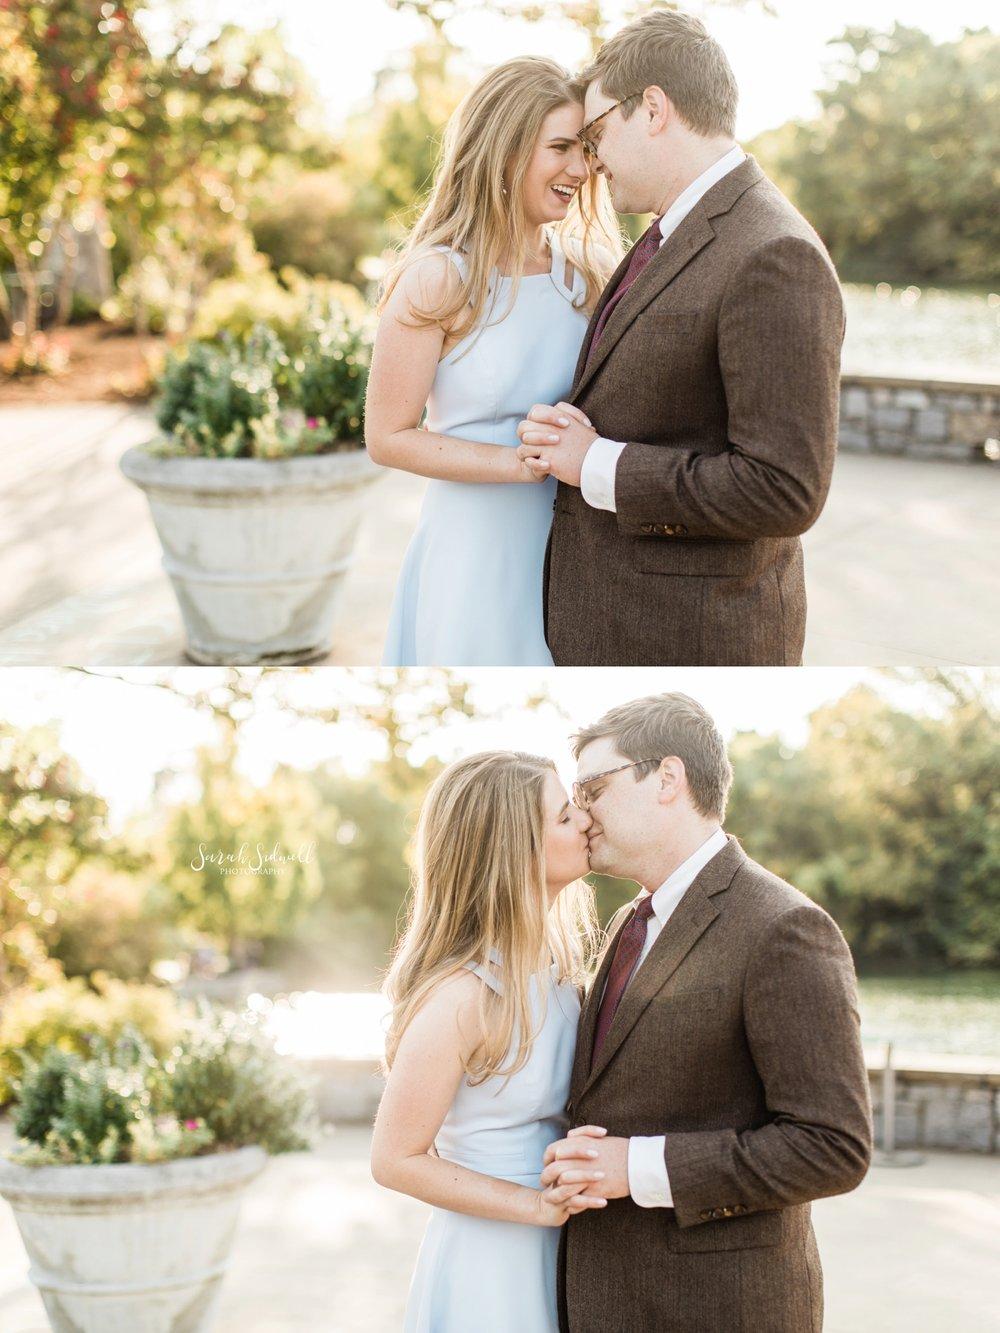 A man kisses his fiance.